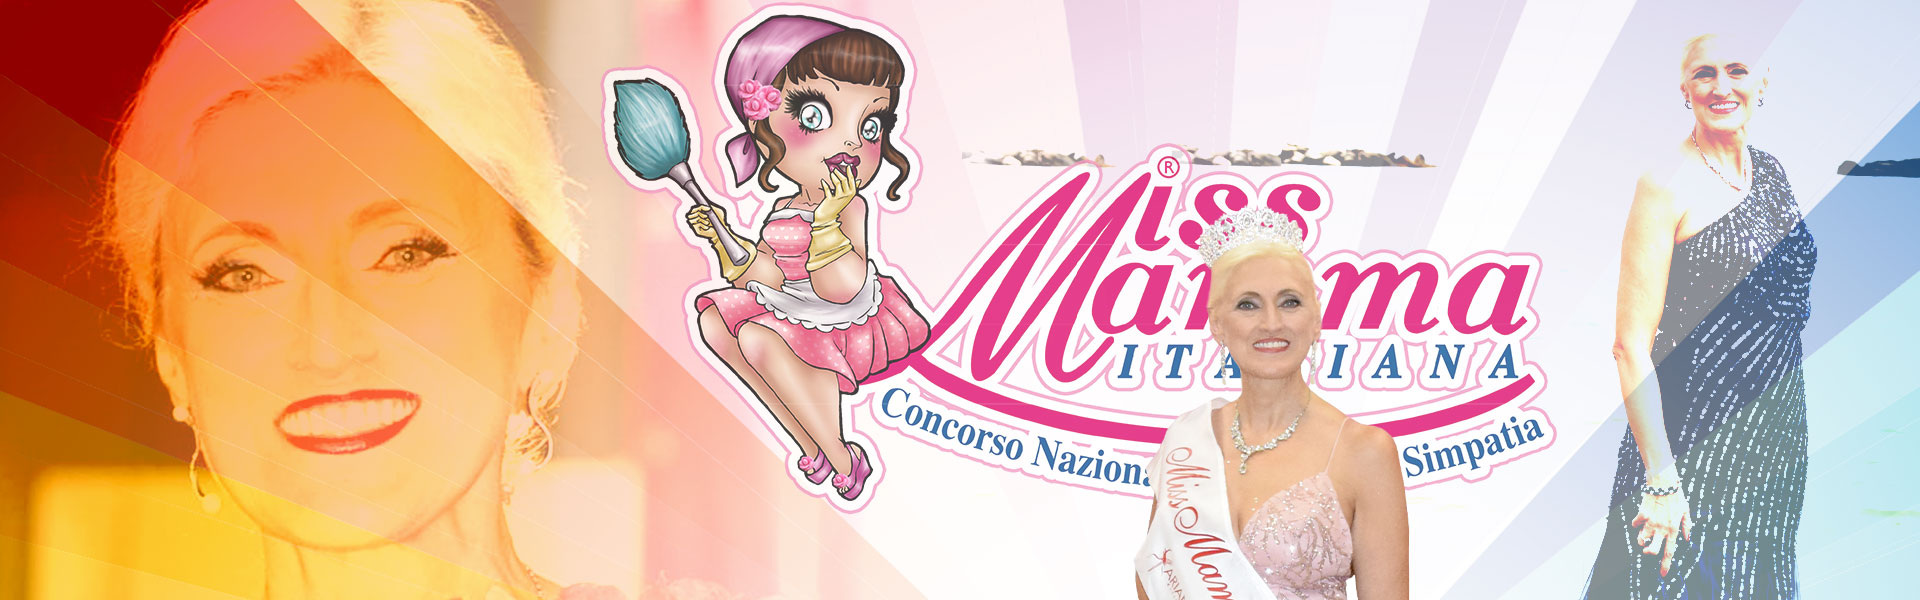 Miss-Mamma-Italiana-Evergreen-2020-Patrizia-Verlicchi-banner-home